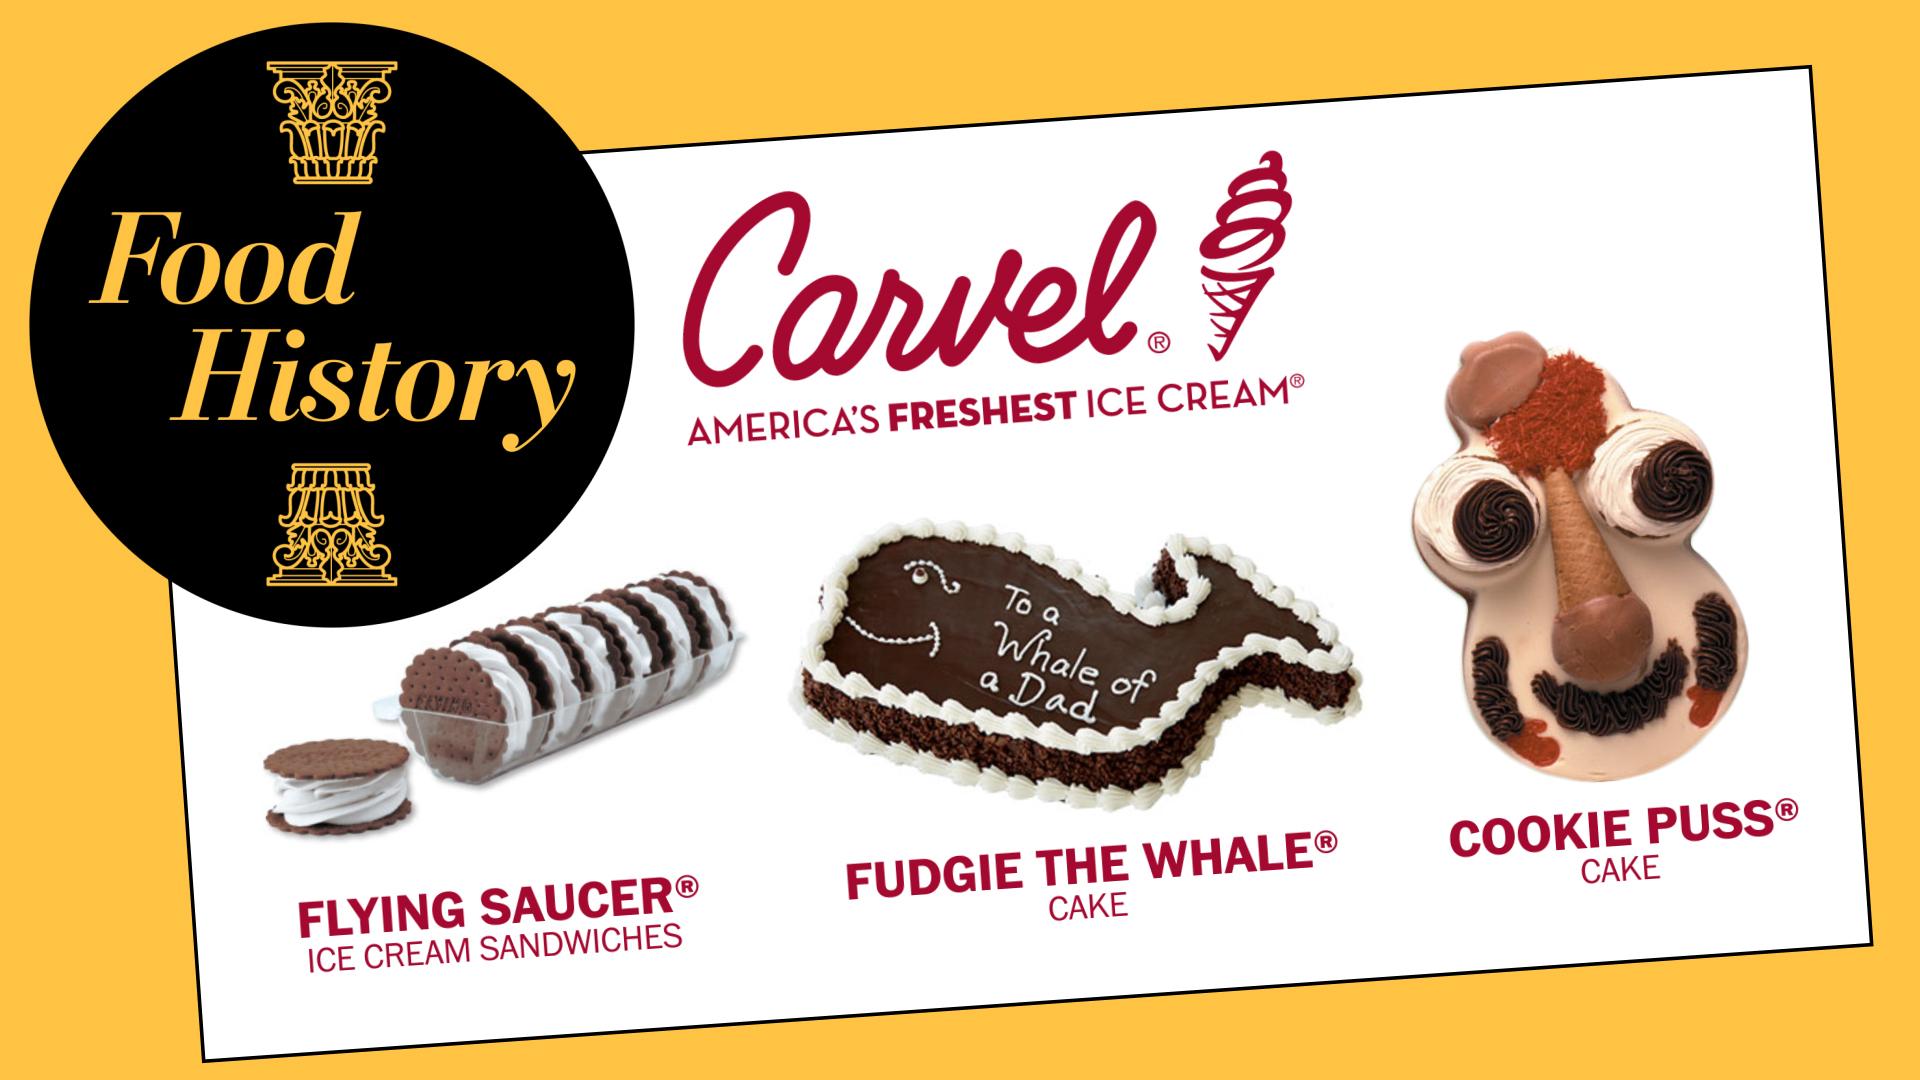 Mary Beth Albright's Food History: Carvel Ice Cream